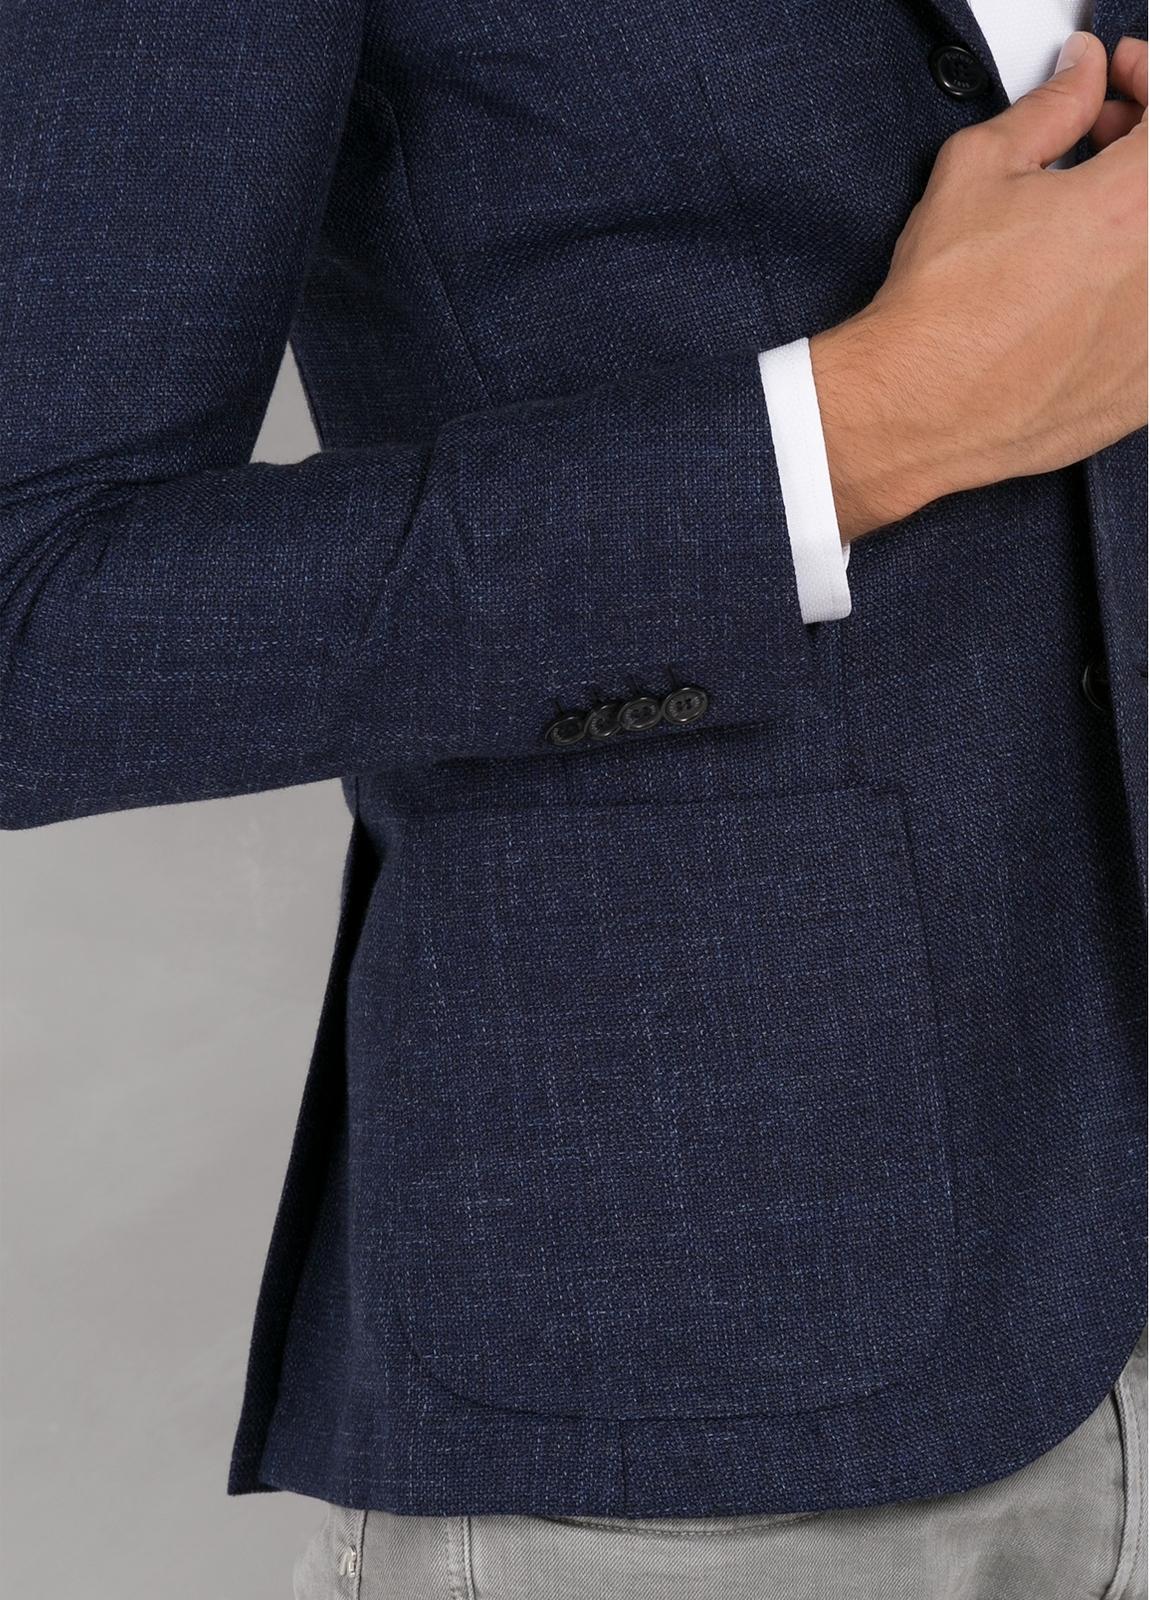 Americana textura ligeramente slim fit color azul, 70% Algodón 30% Lana. - Ítem3